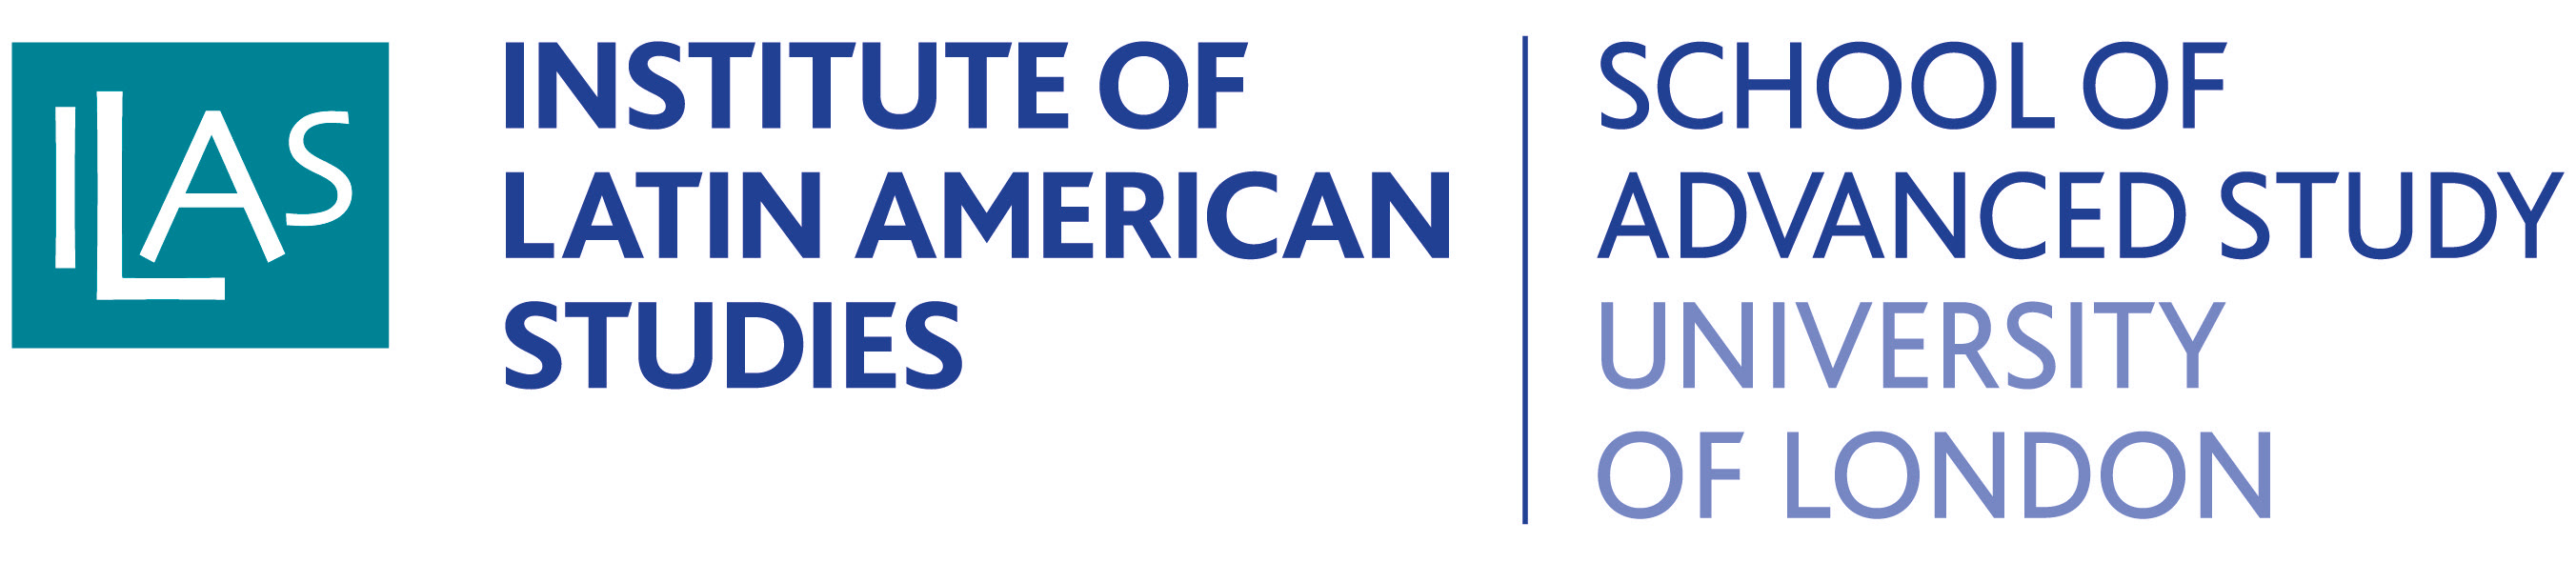 ILAS logo